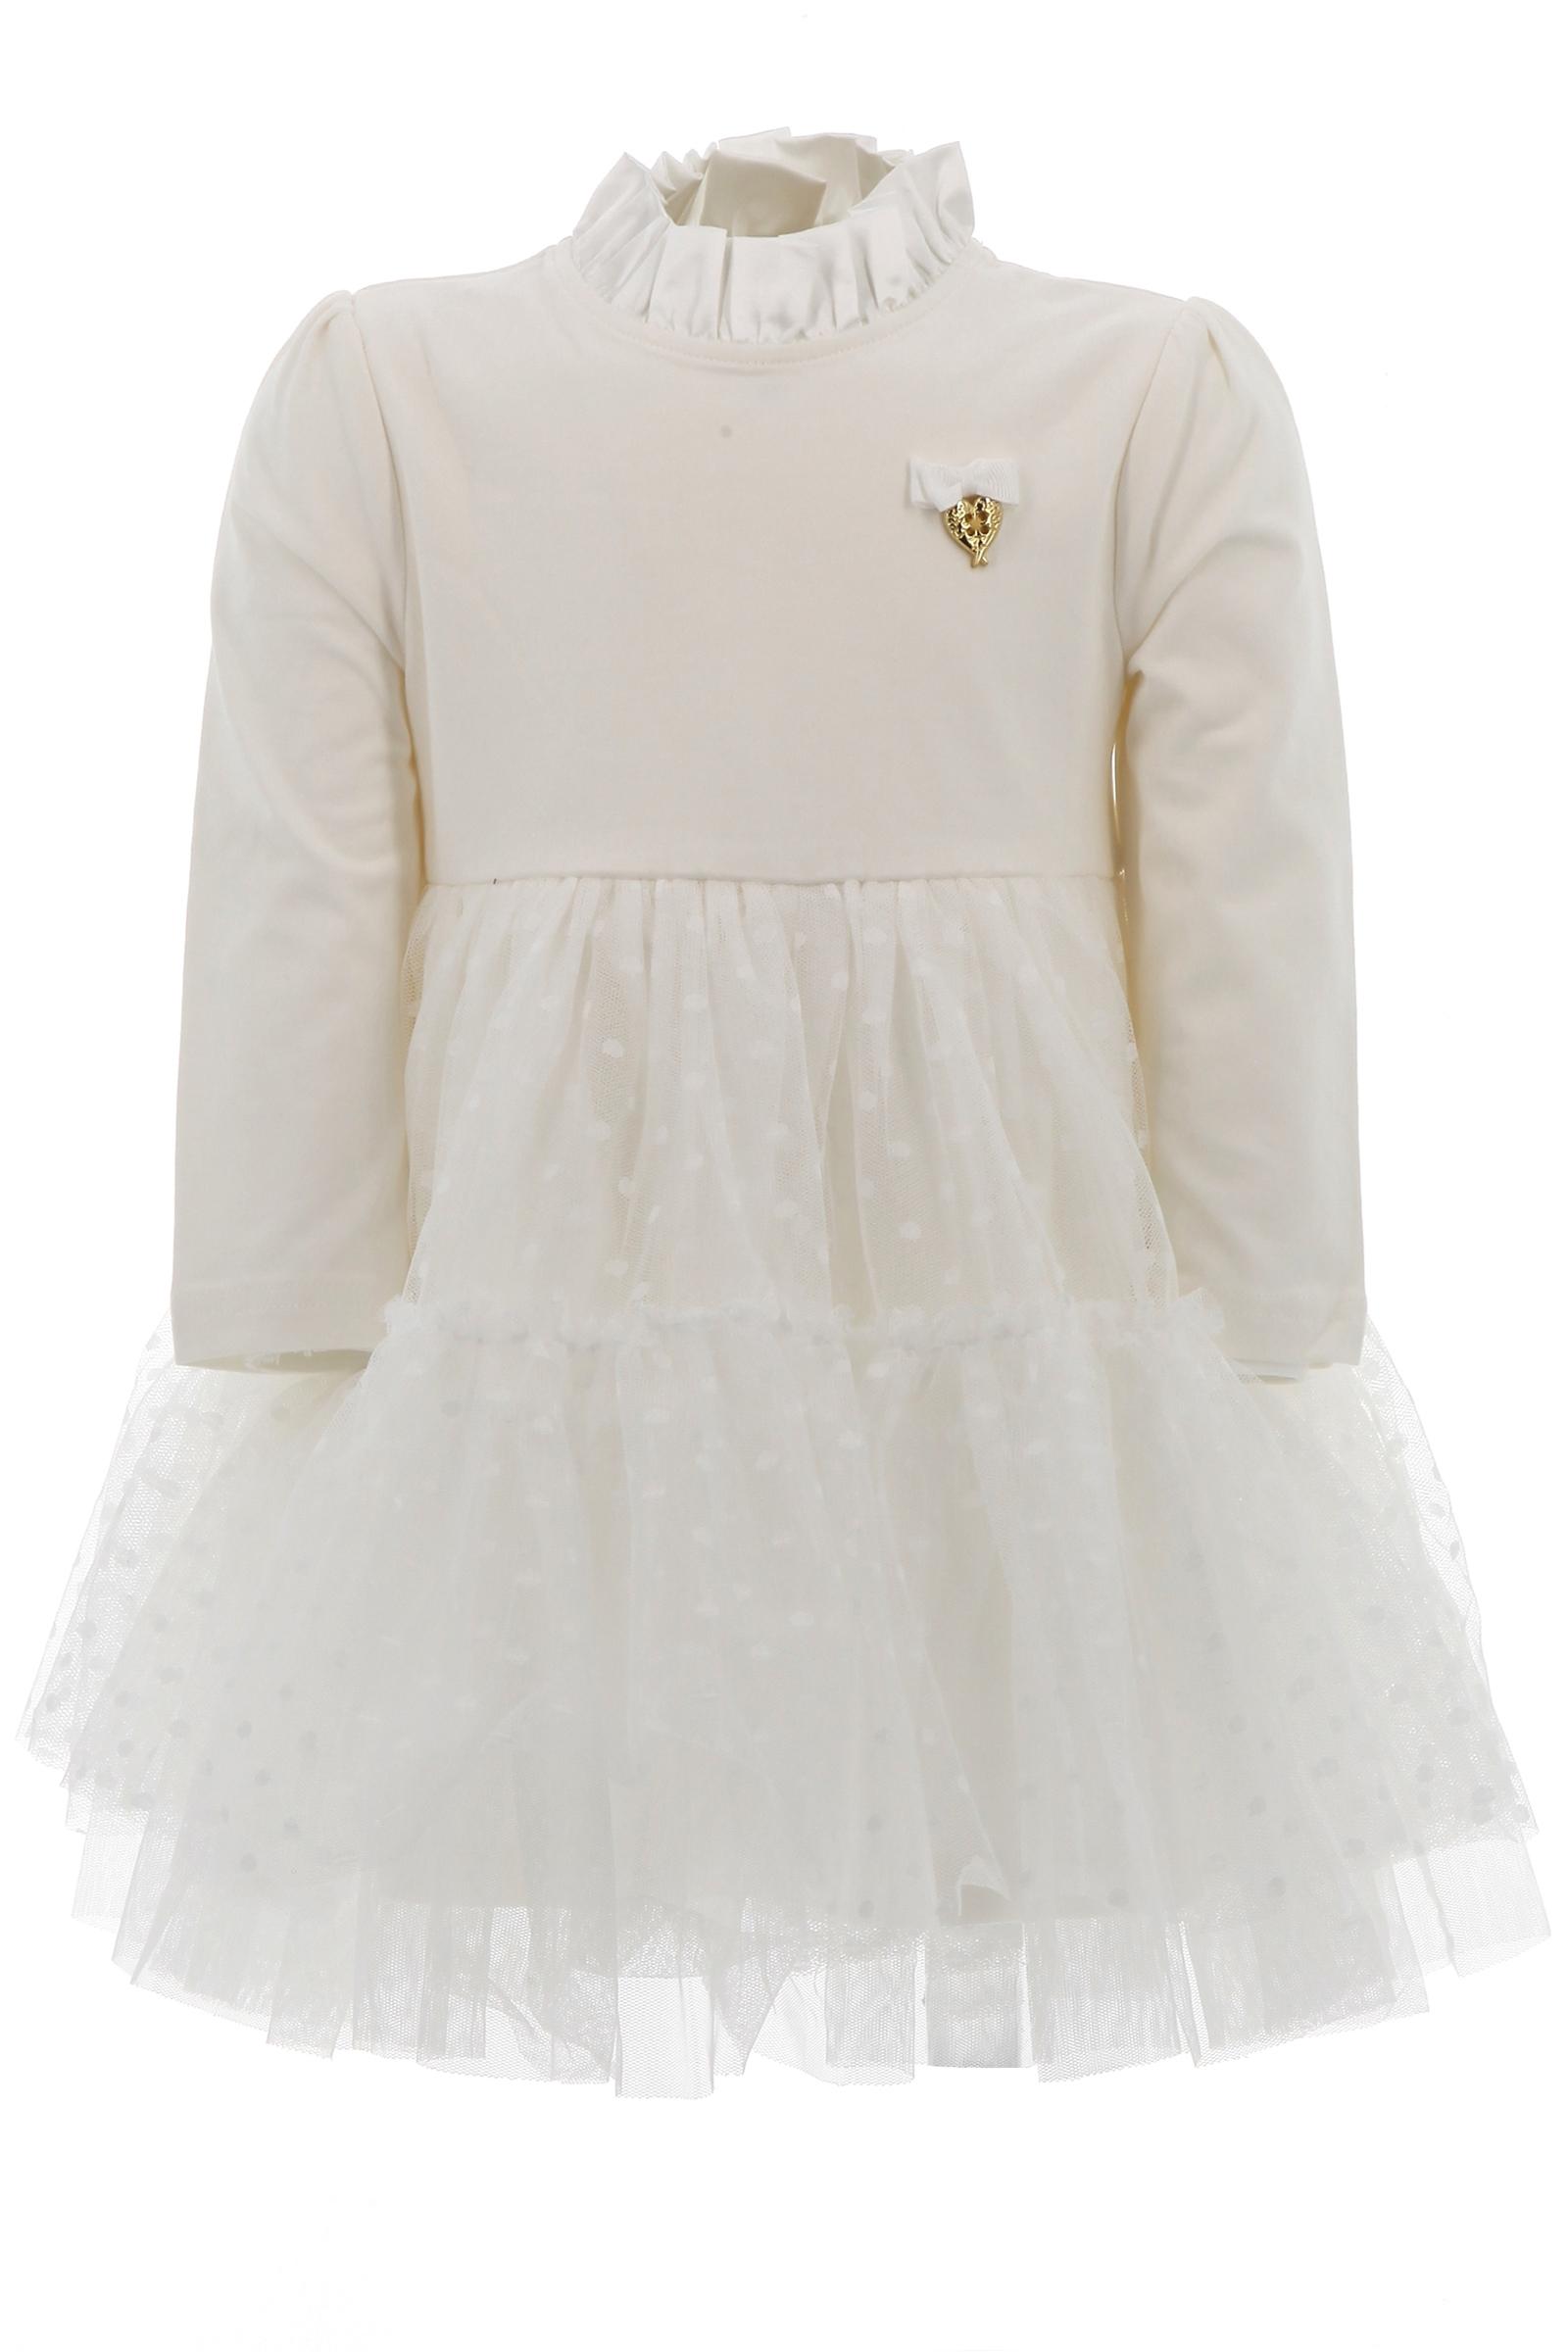 Baptismal dress Angel's Face | Baptism dress | ABIGALESNOWDROP